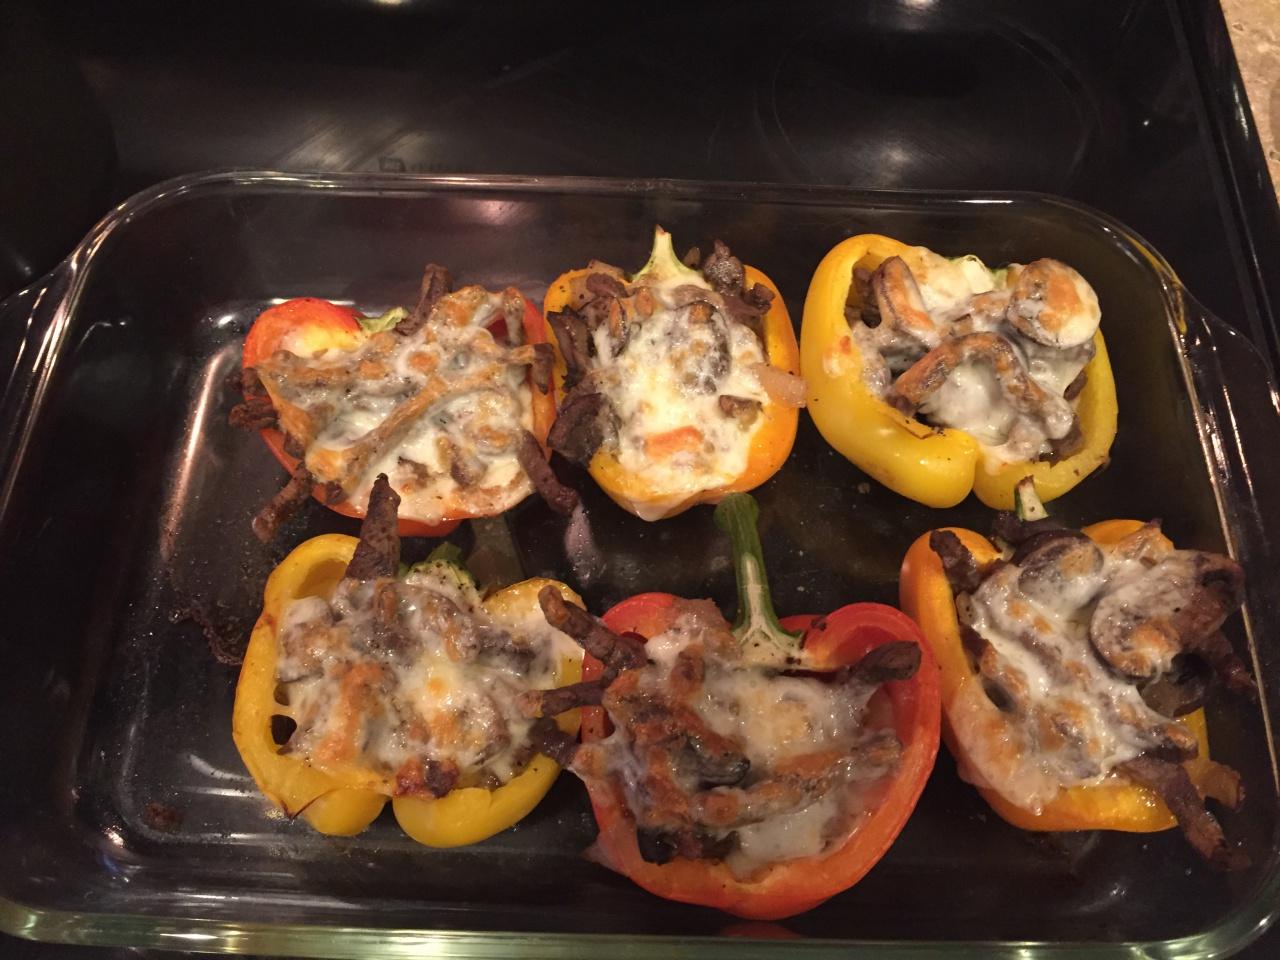 Philly cheesesteak stuffed peppers-48b8ed23-1d36-48d2-aa5f-e5a67aa2e889-jpg